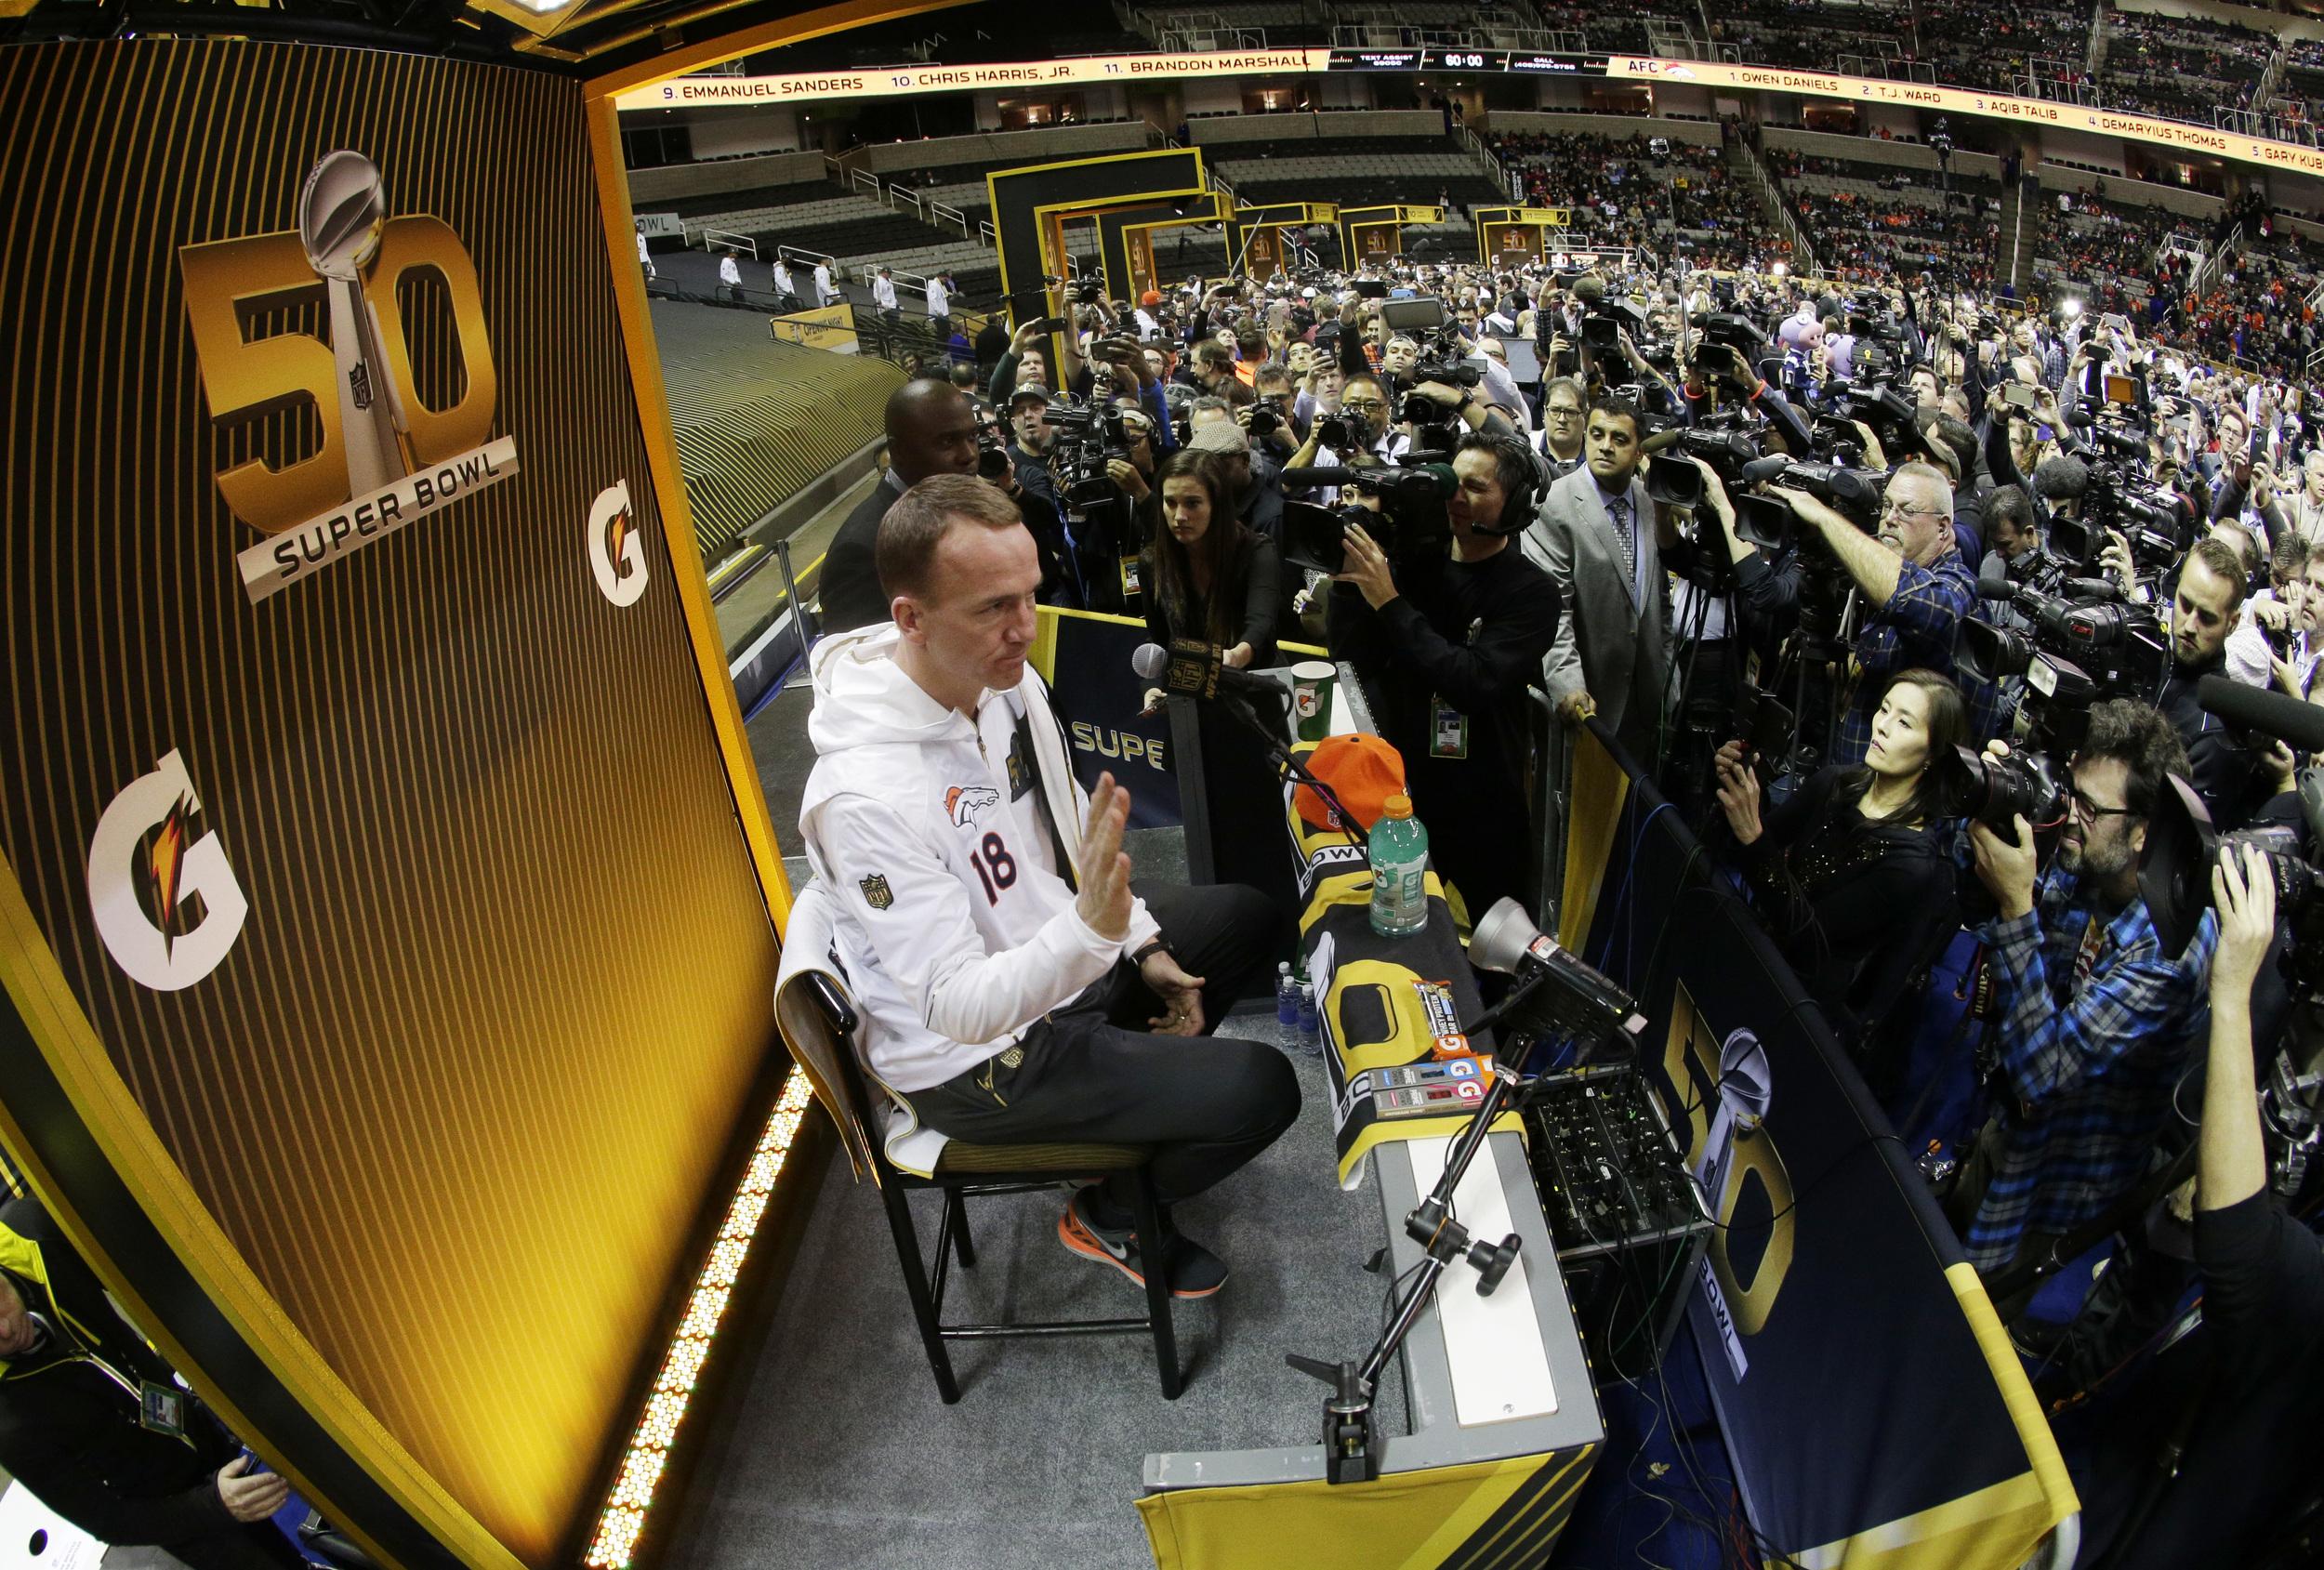 Denver Broncos quarterback Peyton Manning speaks to the media during Opening Night for the NFL Super Bowl 50 football game Monday, Feb. 1, 2016, in San Jose, Calif. (Charlie Riedel/AP)